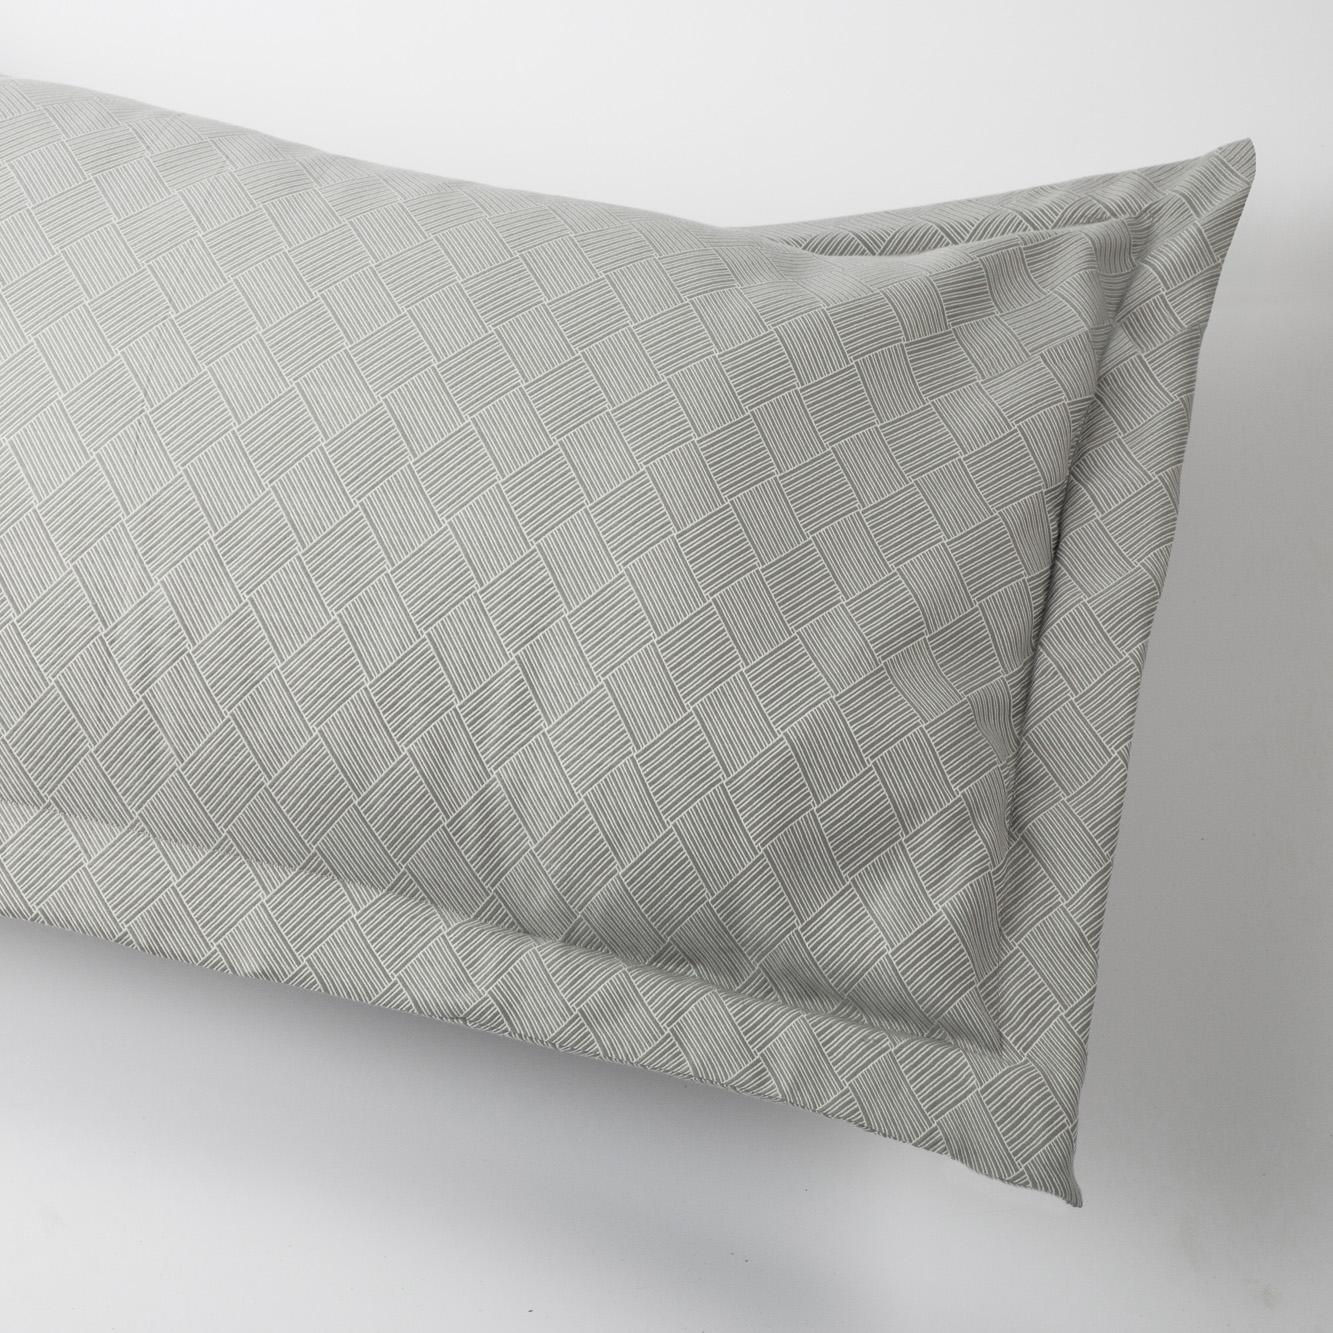 Toulon Oxford Pillowcase